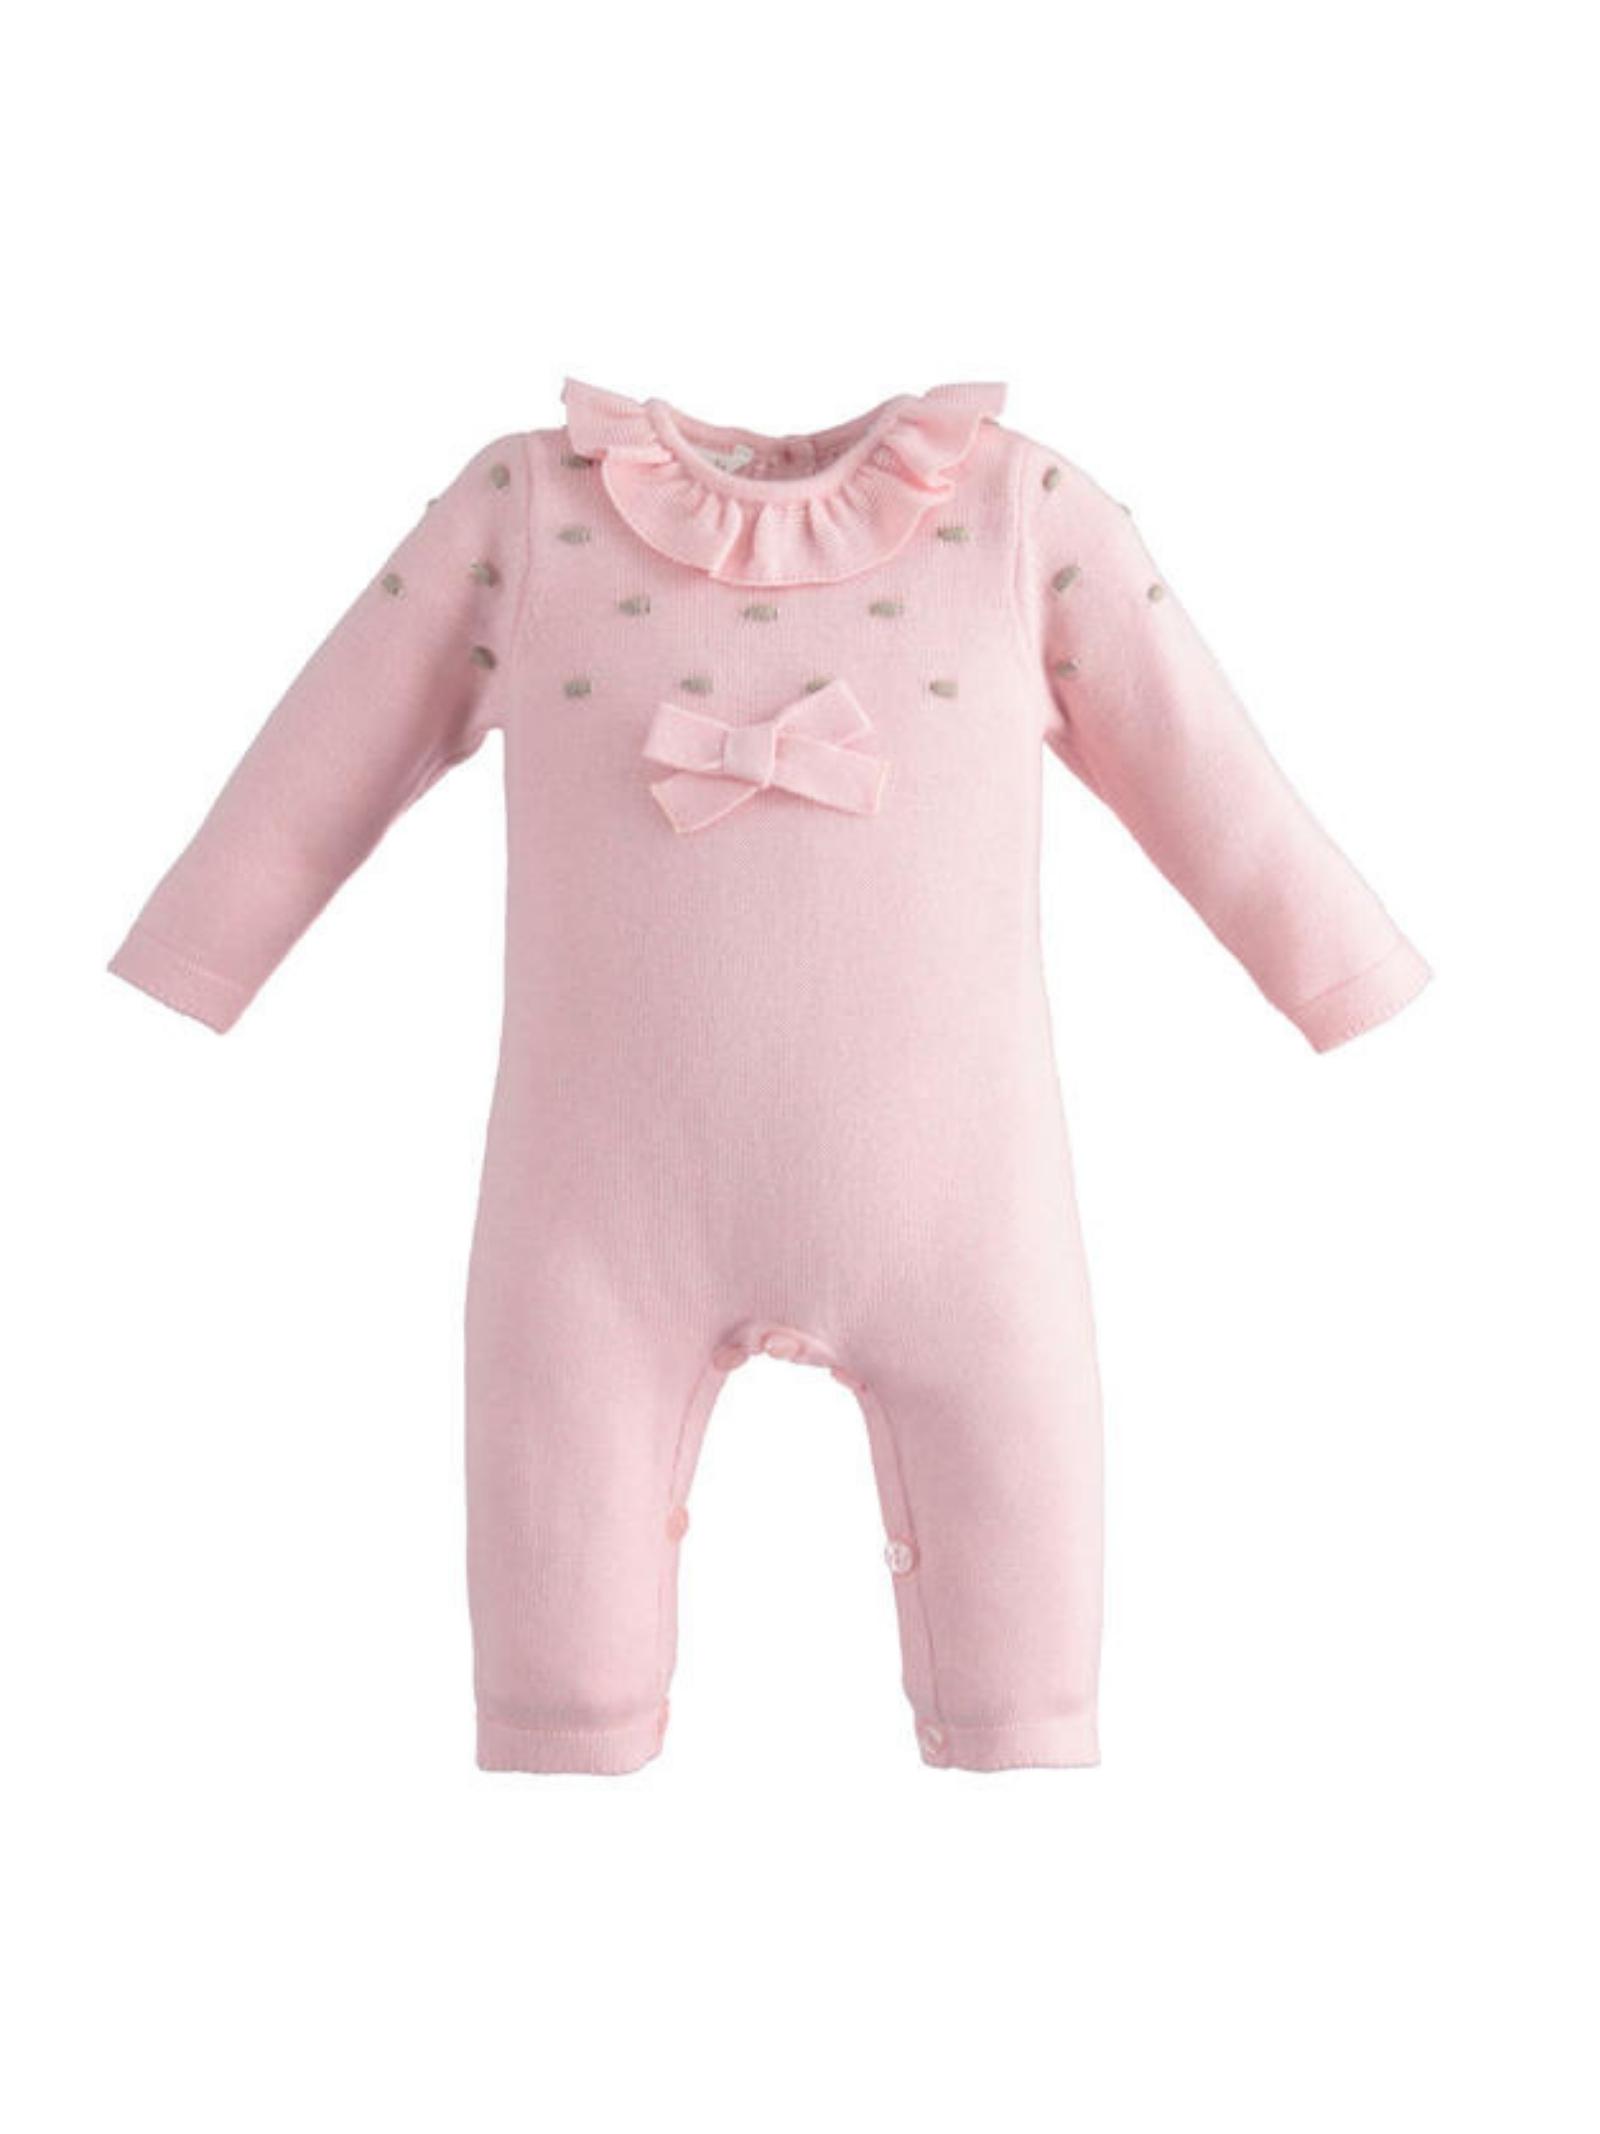 Baby girl polka dot romper MINIBANDA | Rompers | 33746002715